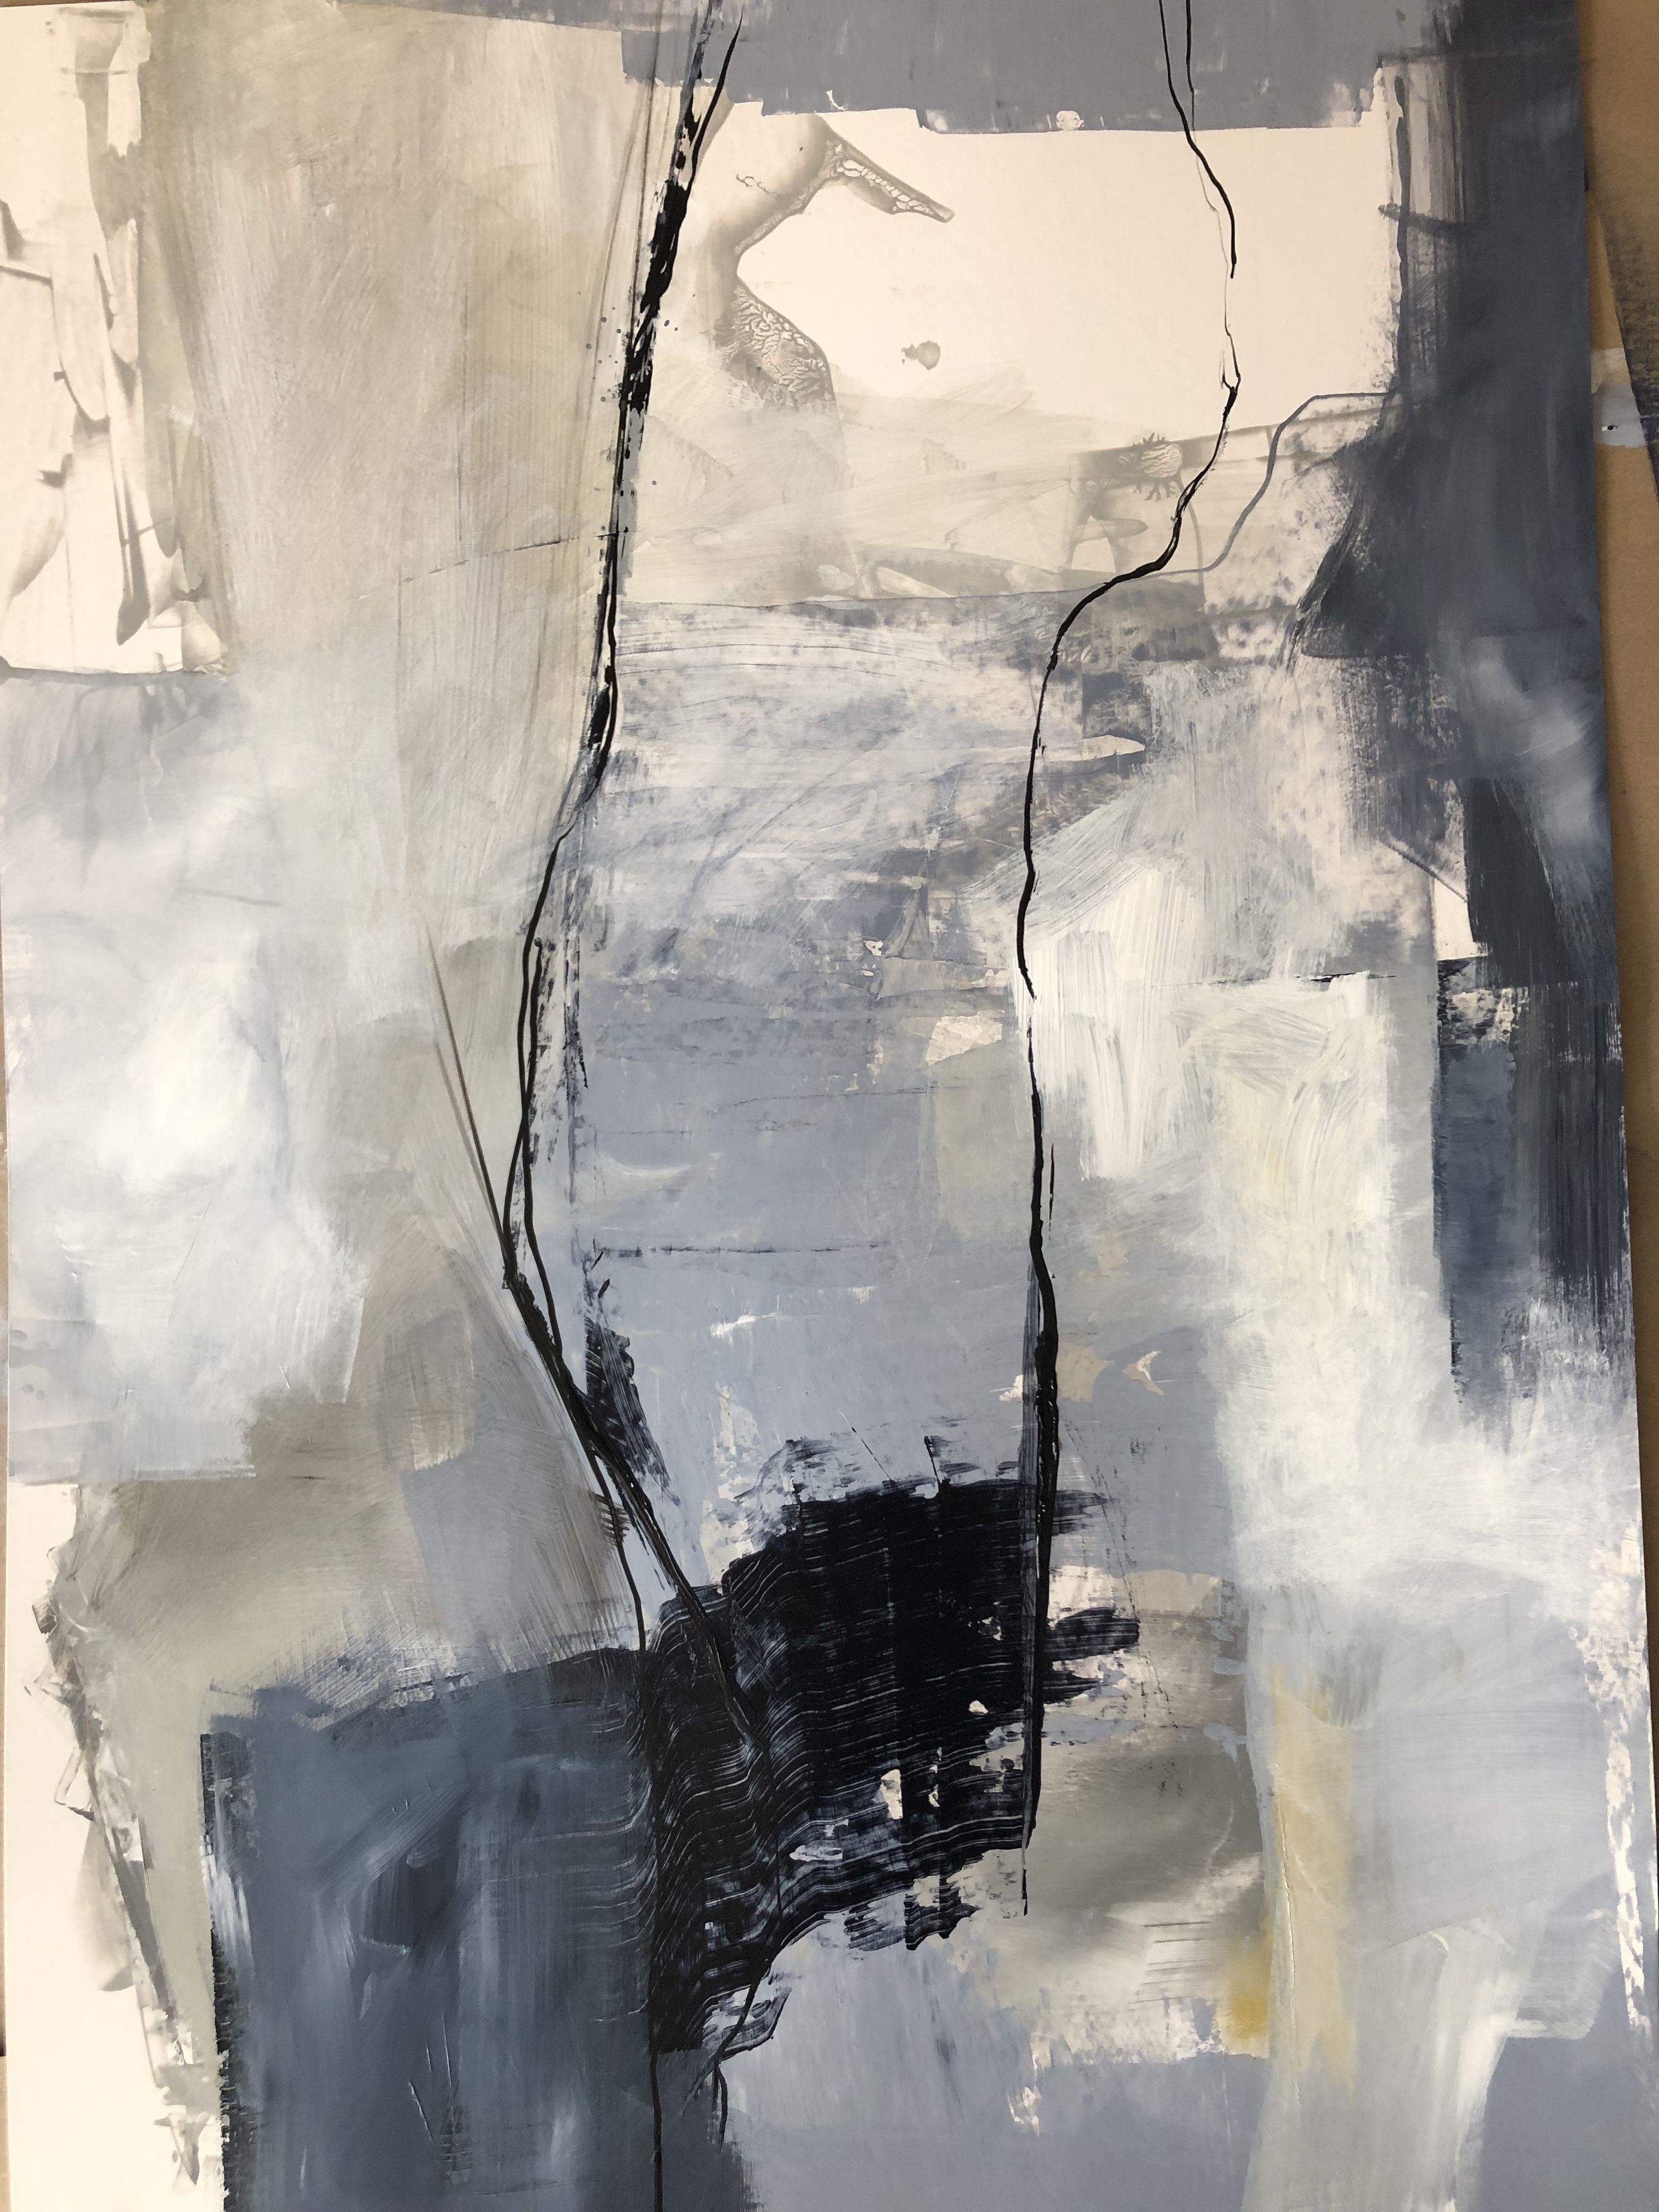 irina nass abstrakte malerei acryl acrylbilder abstrakt kunst abstraktes bild kaufen gesicht